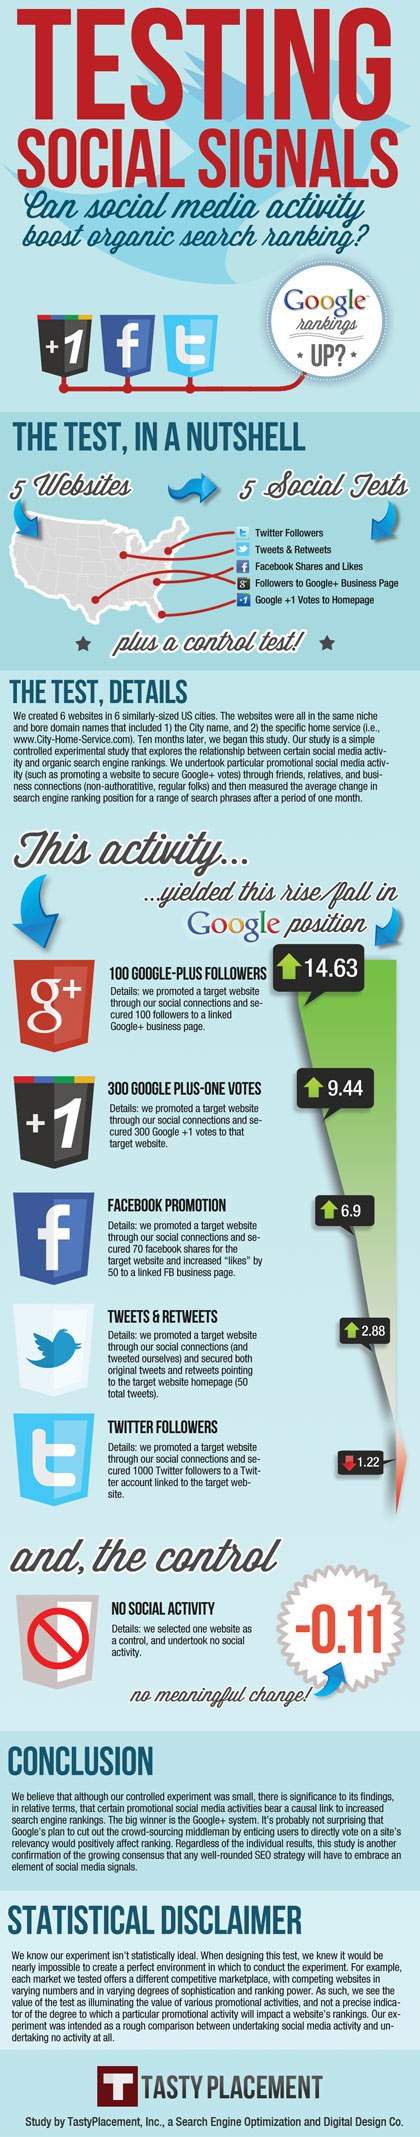 Social Media Infographic: Testing Social Signals